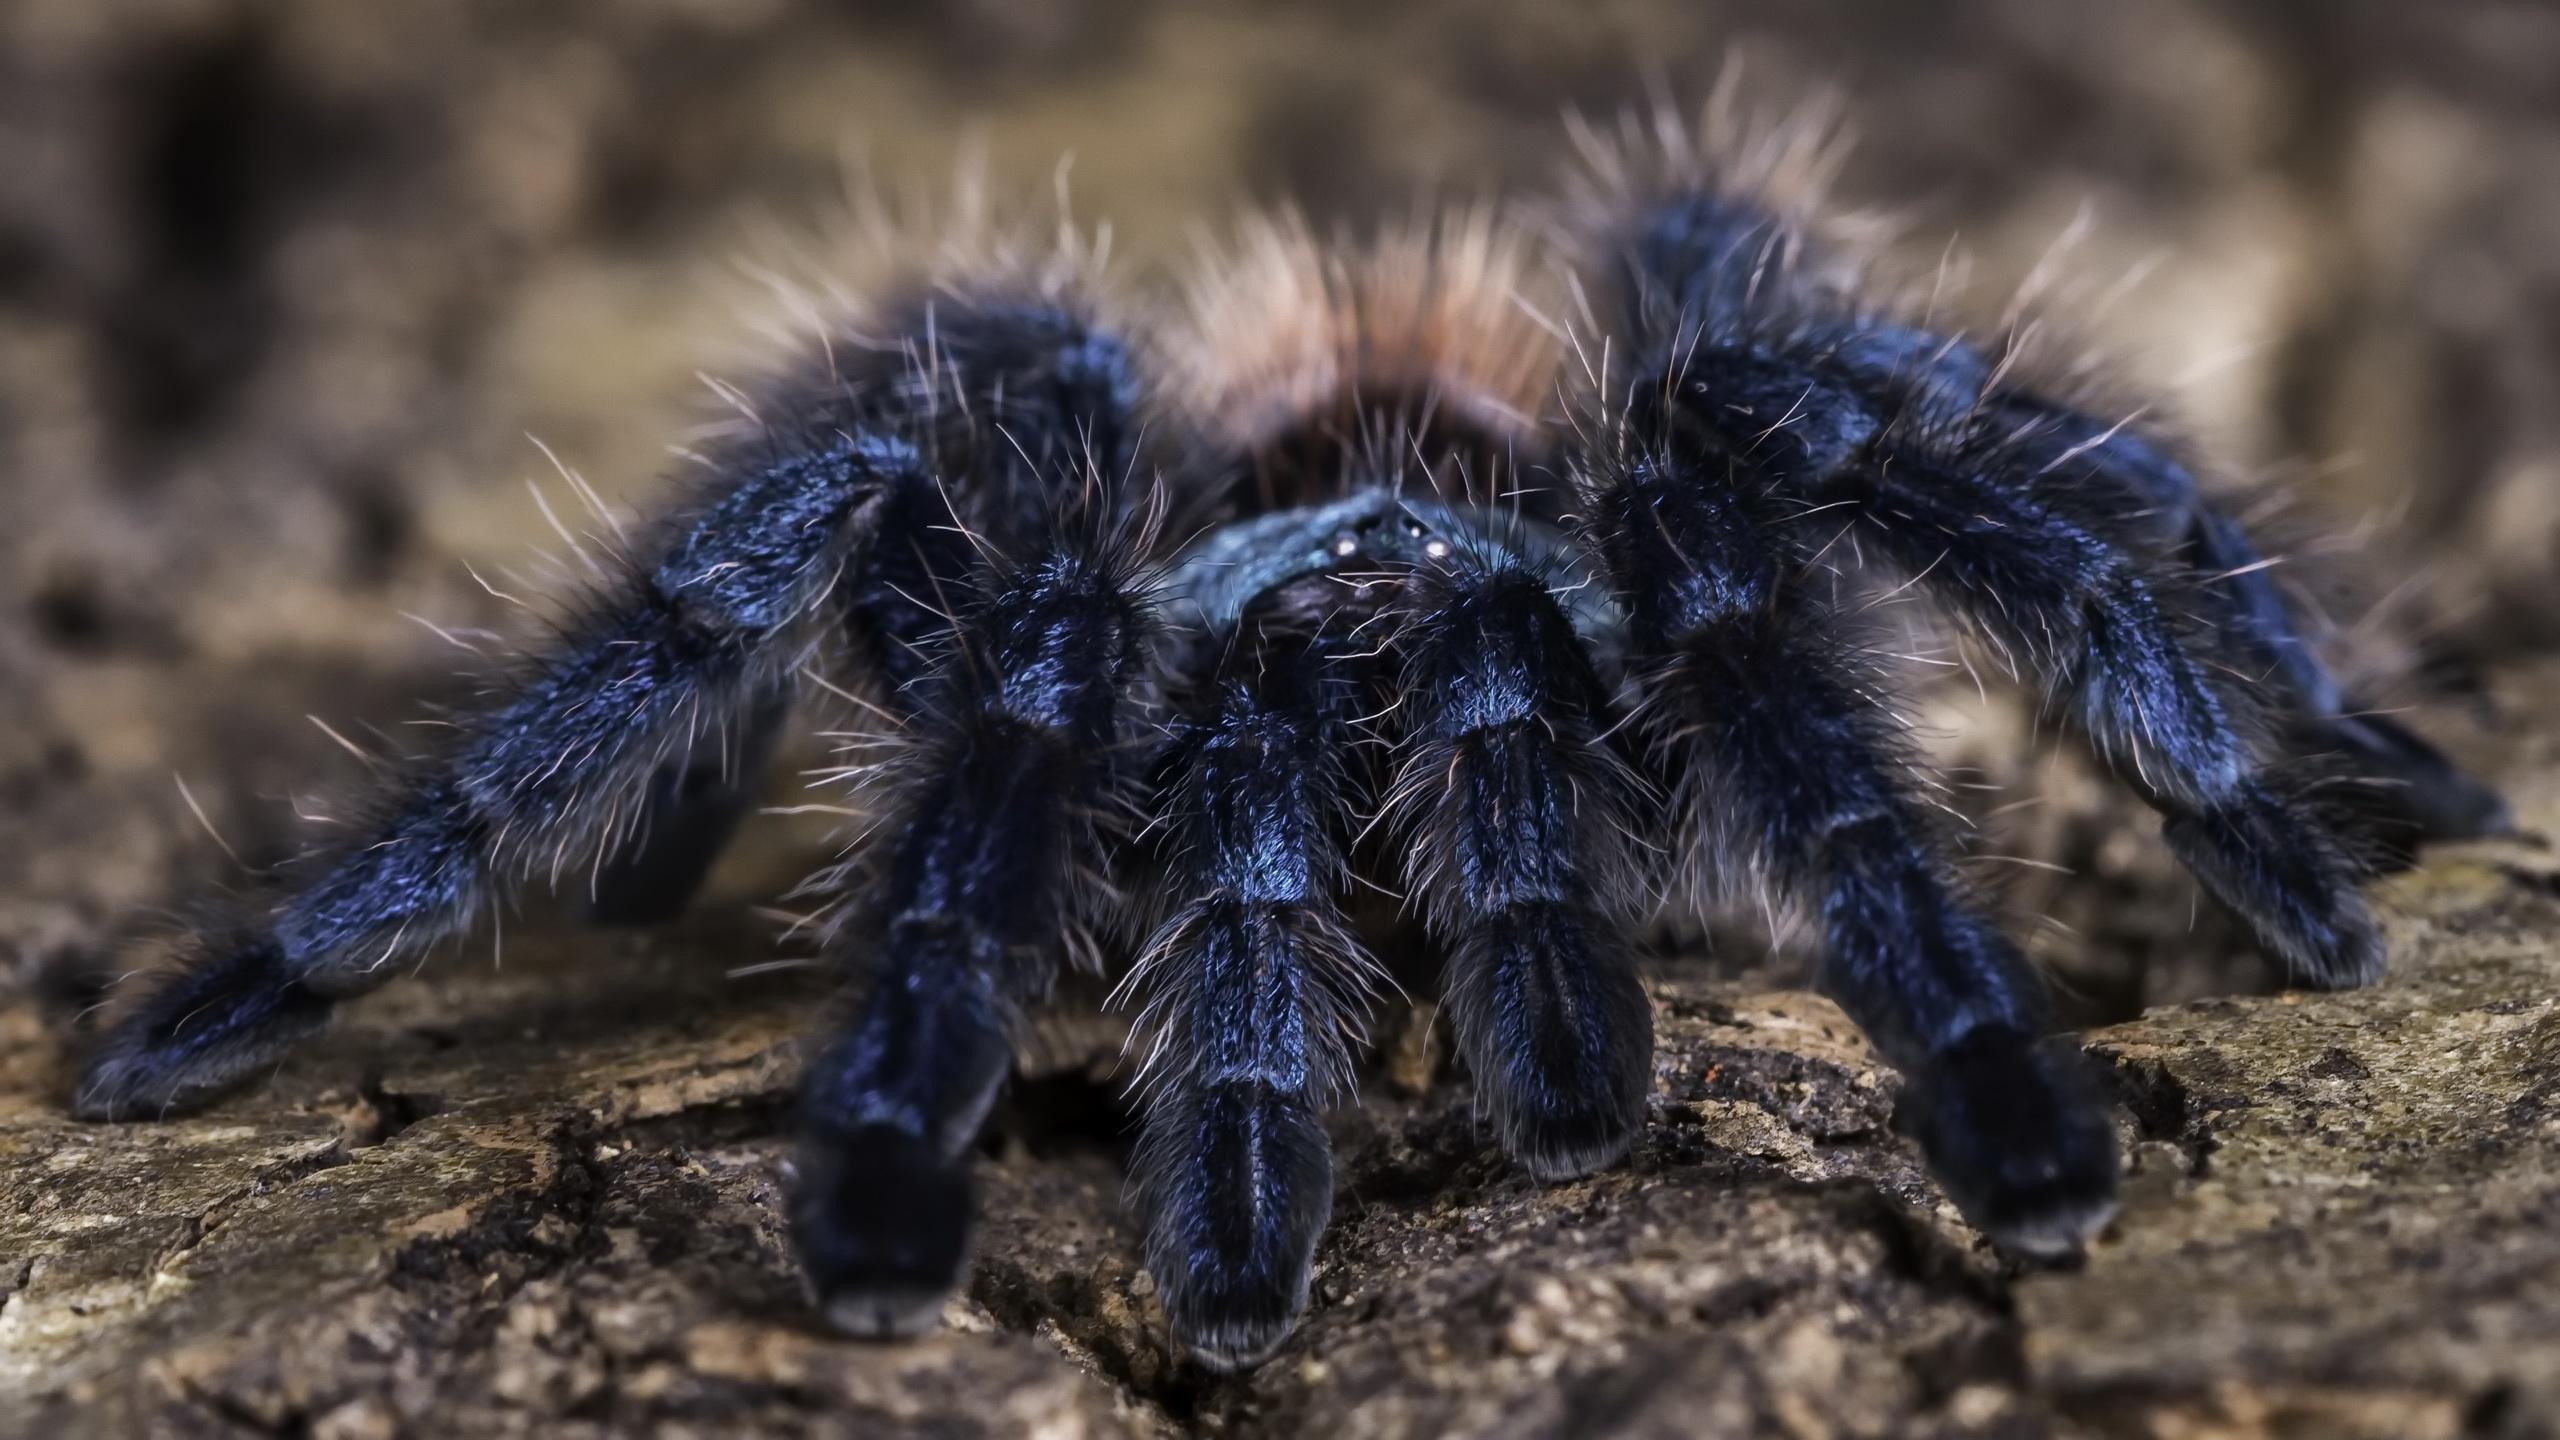 картинки с пауками тарантулами представляют